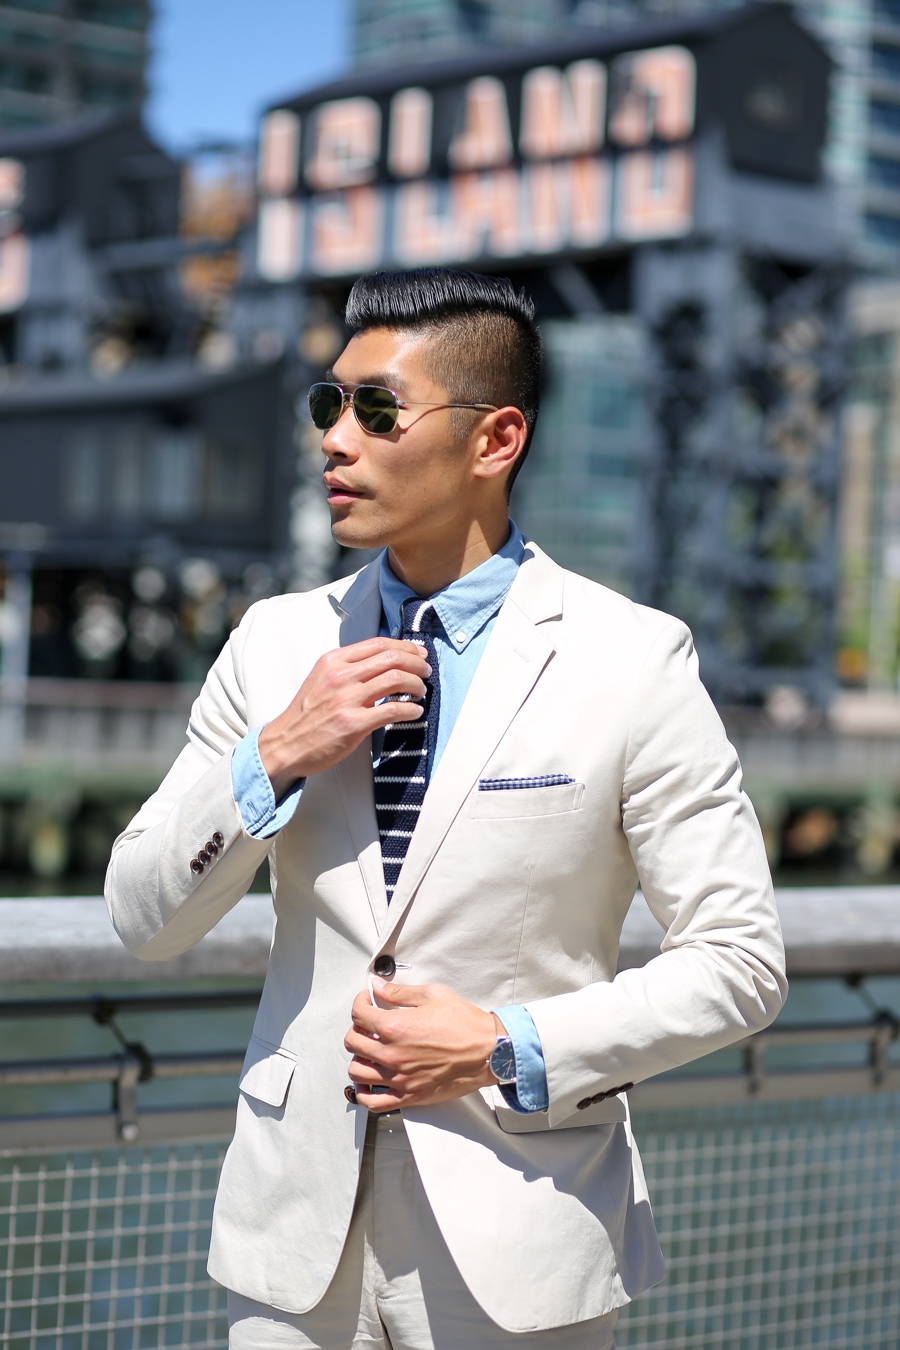 Levitate Style, Leo Chan, menswear, Alicia Mara, Suede Wingtip, Allen Edmonds